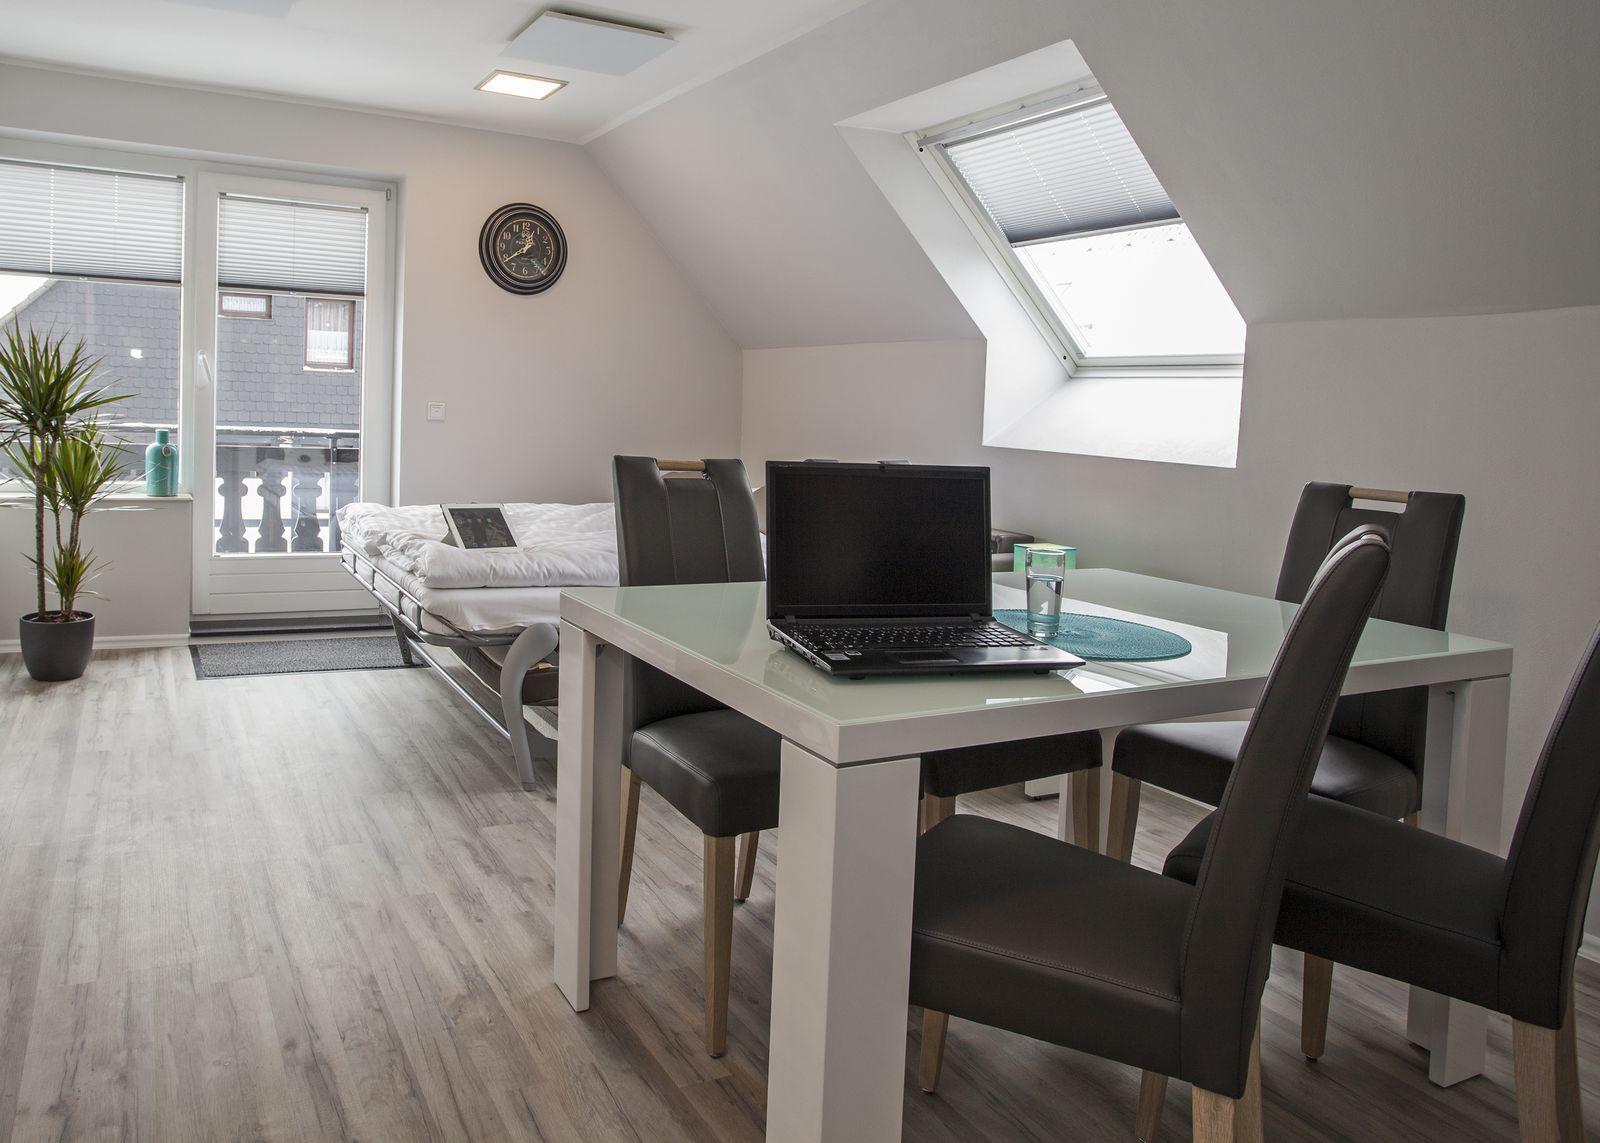 Apartment - Comfort 5 Persons